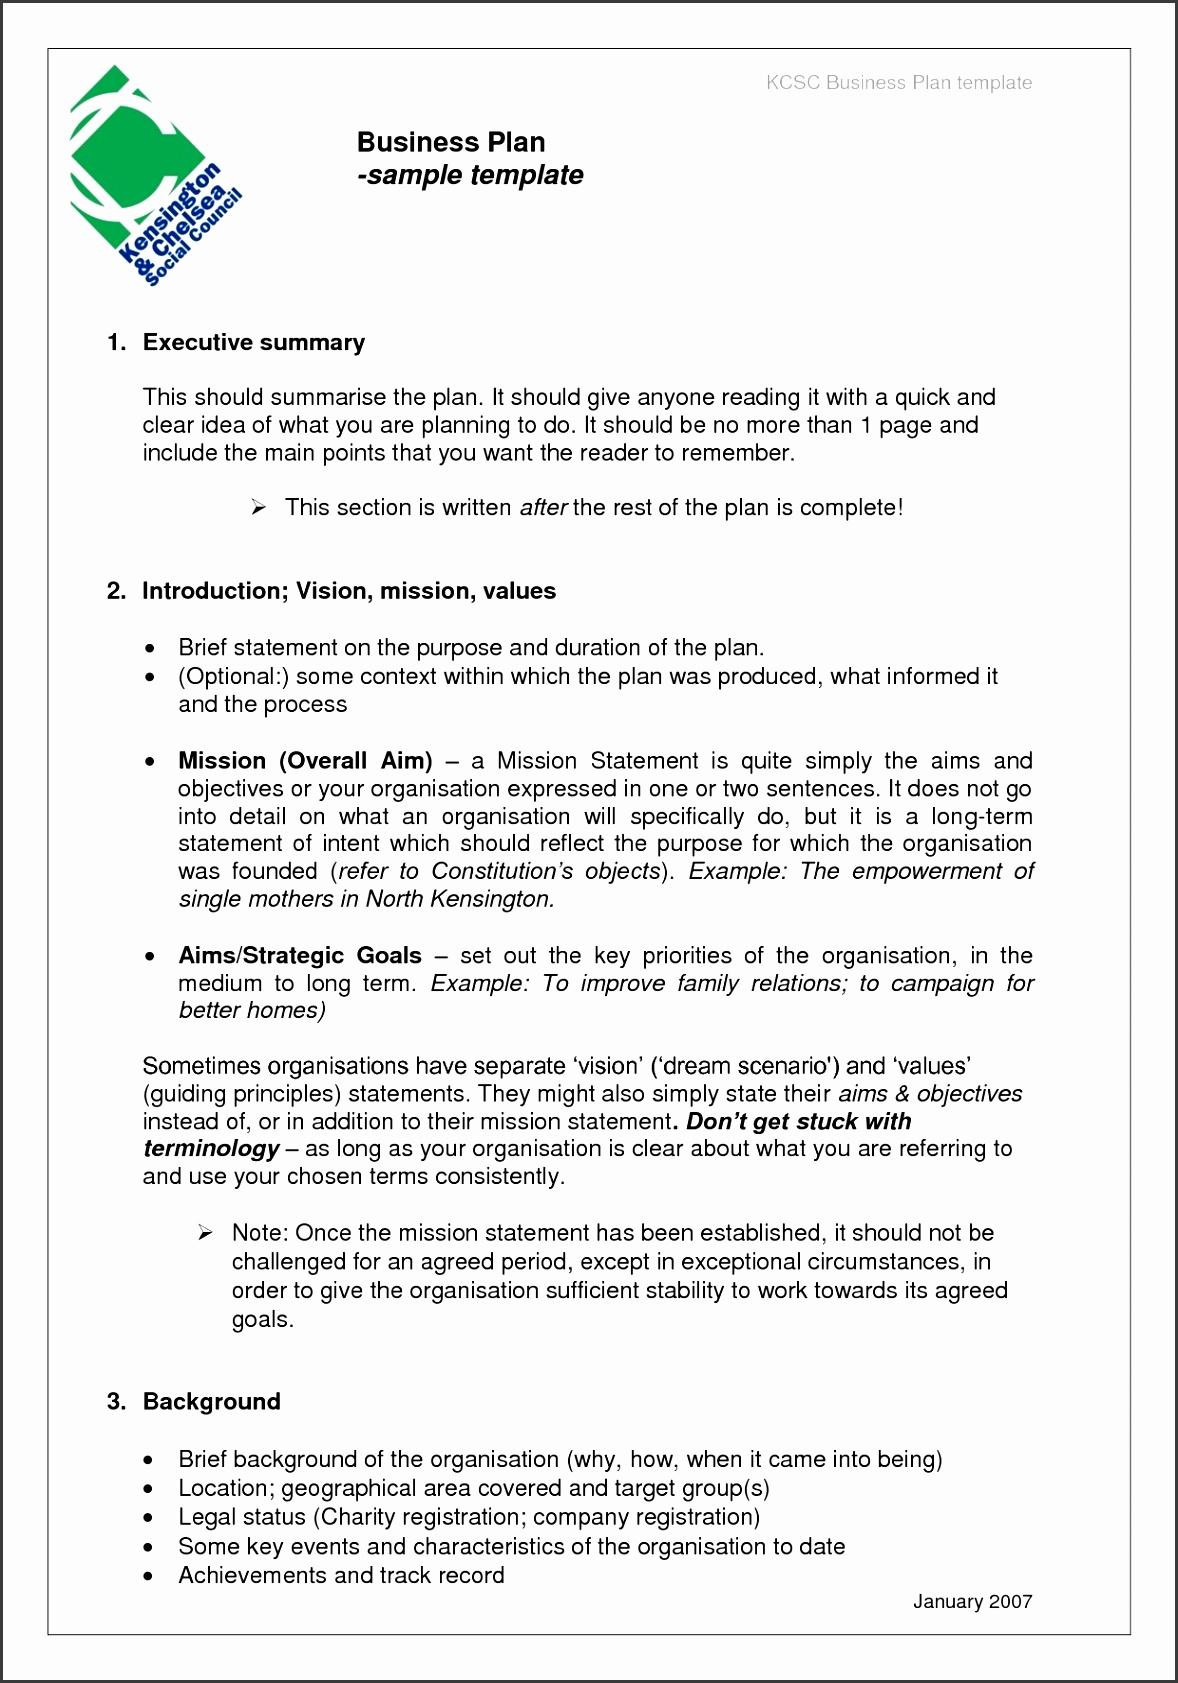 free small business plan templates uk free small business plan template australia free small business proposal